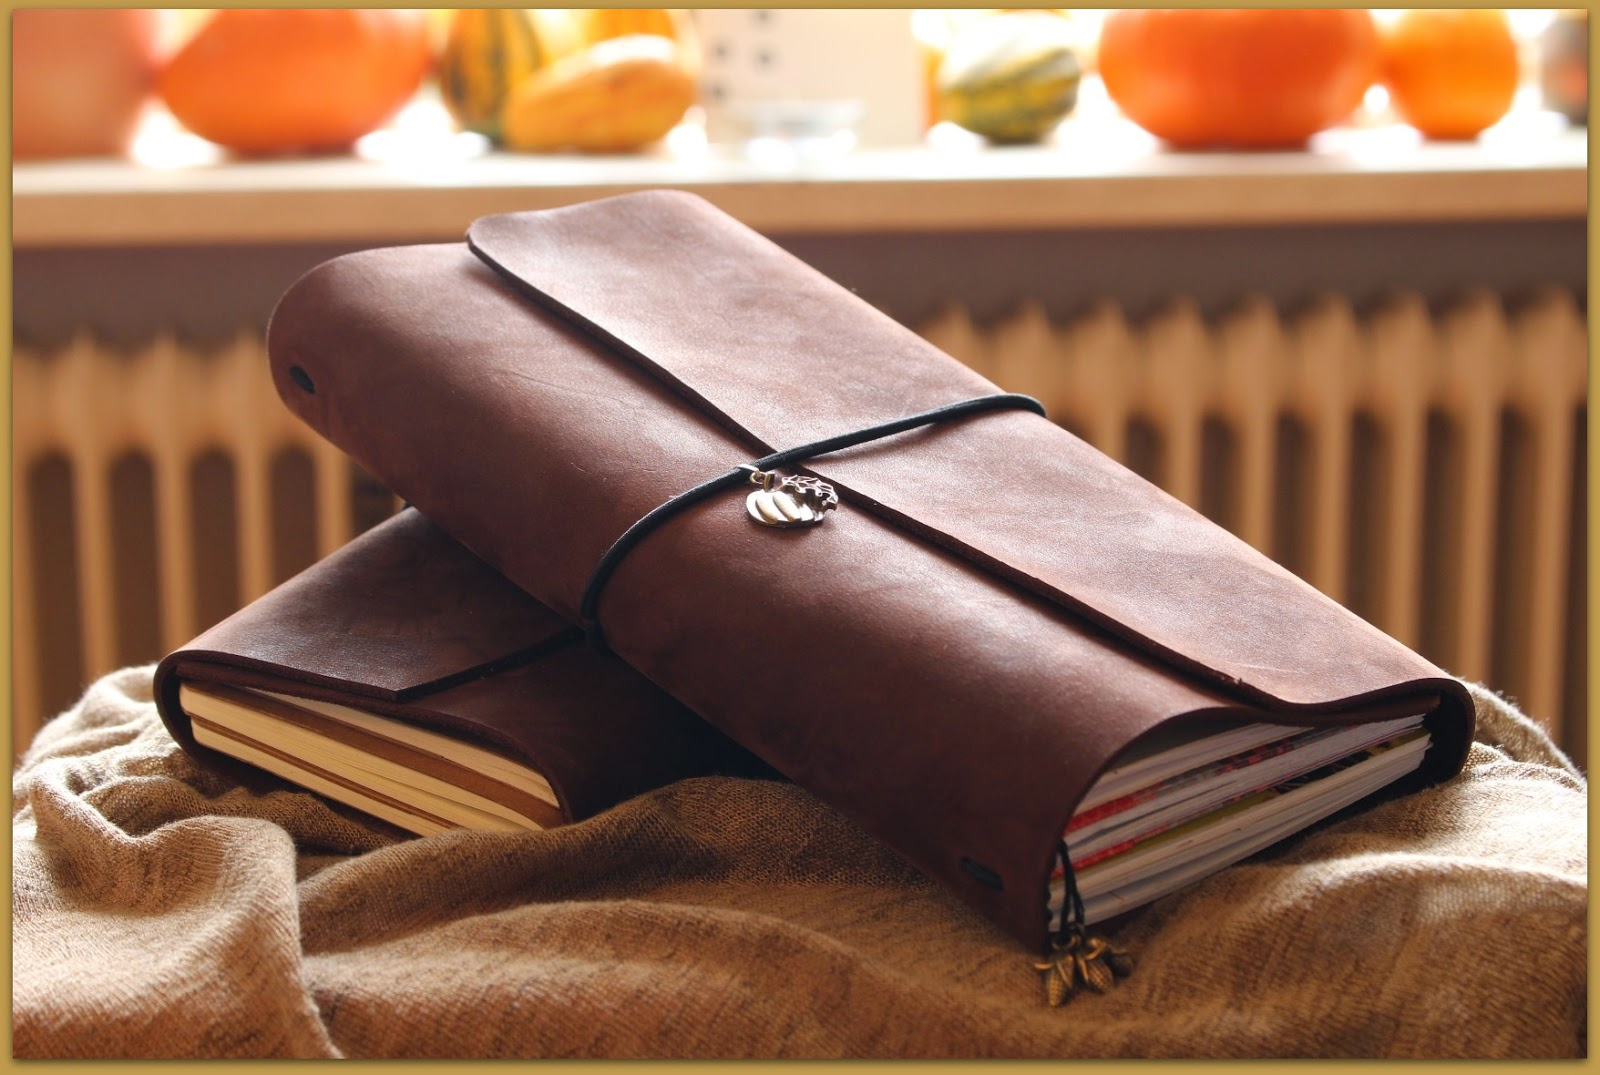 Midori fauxdori Travelers Notebook regular size and A6